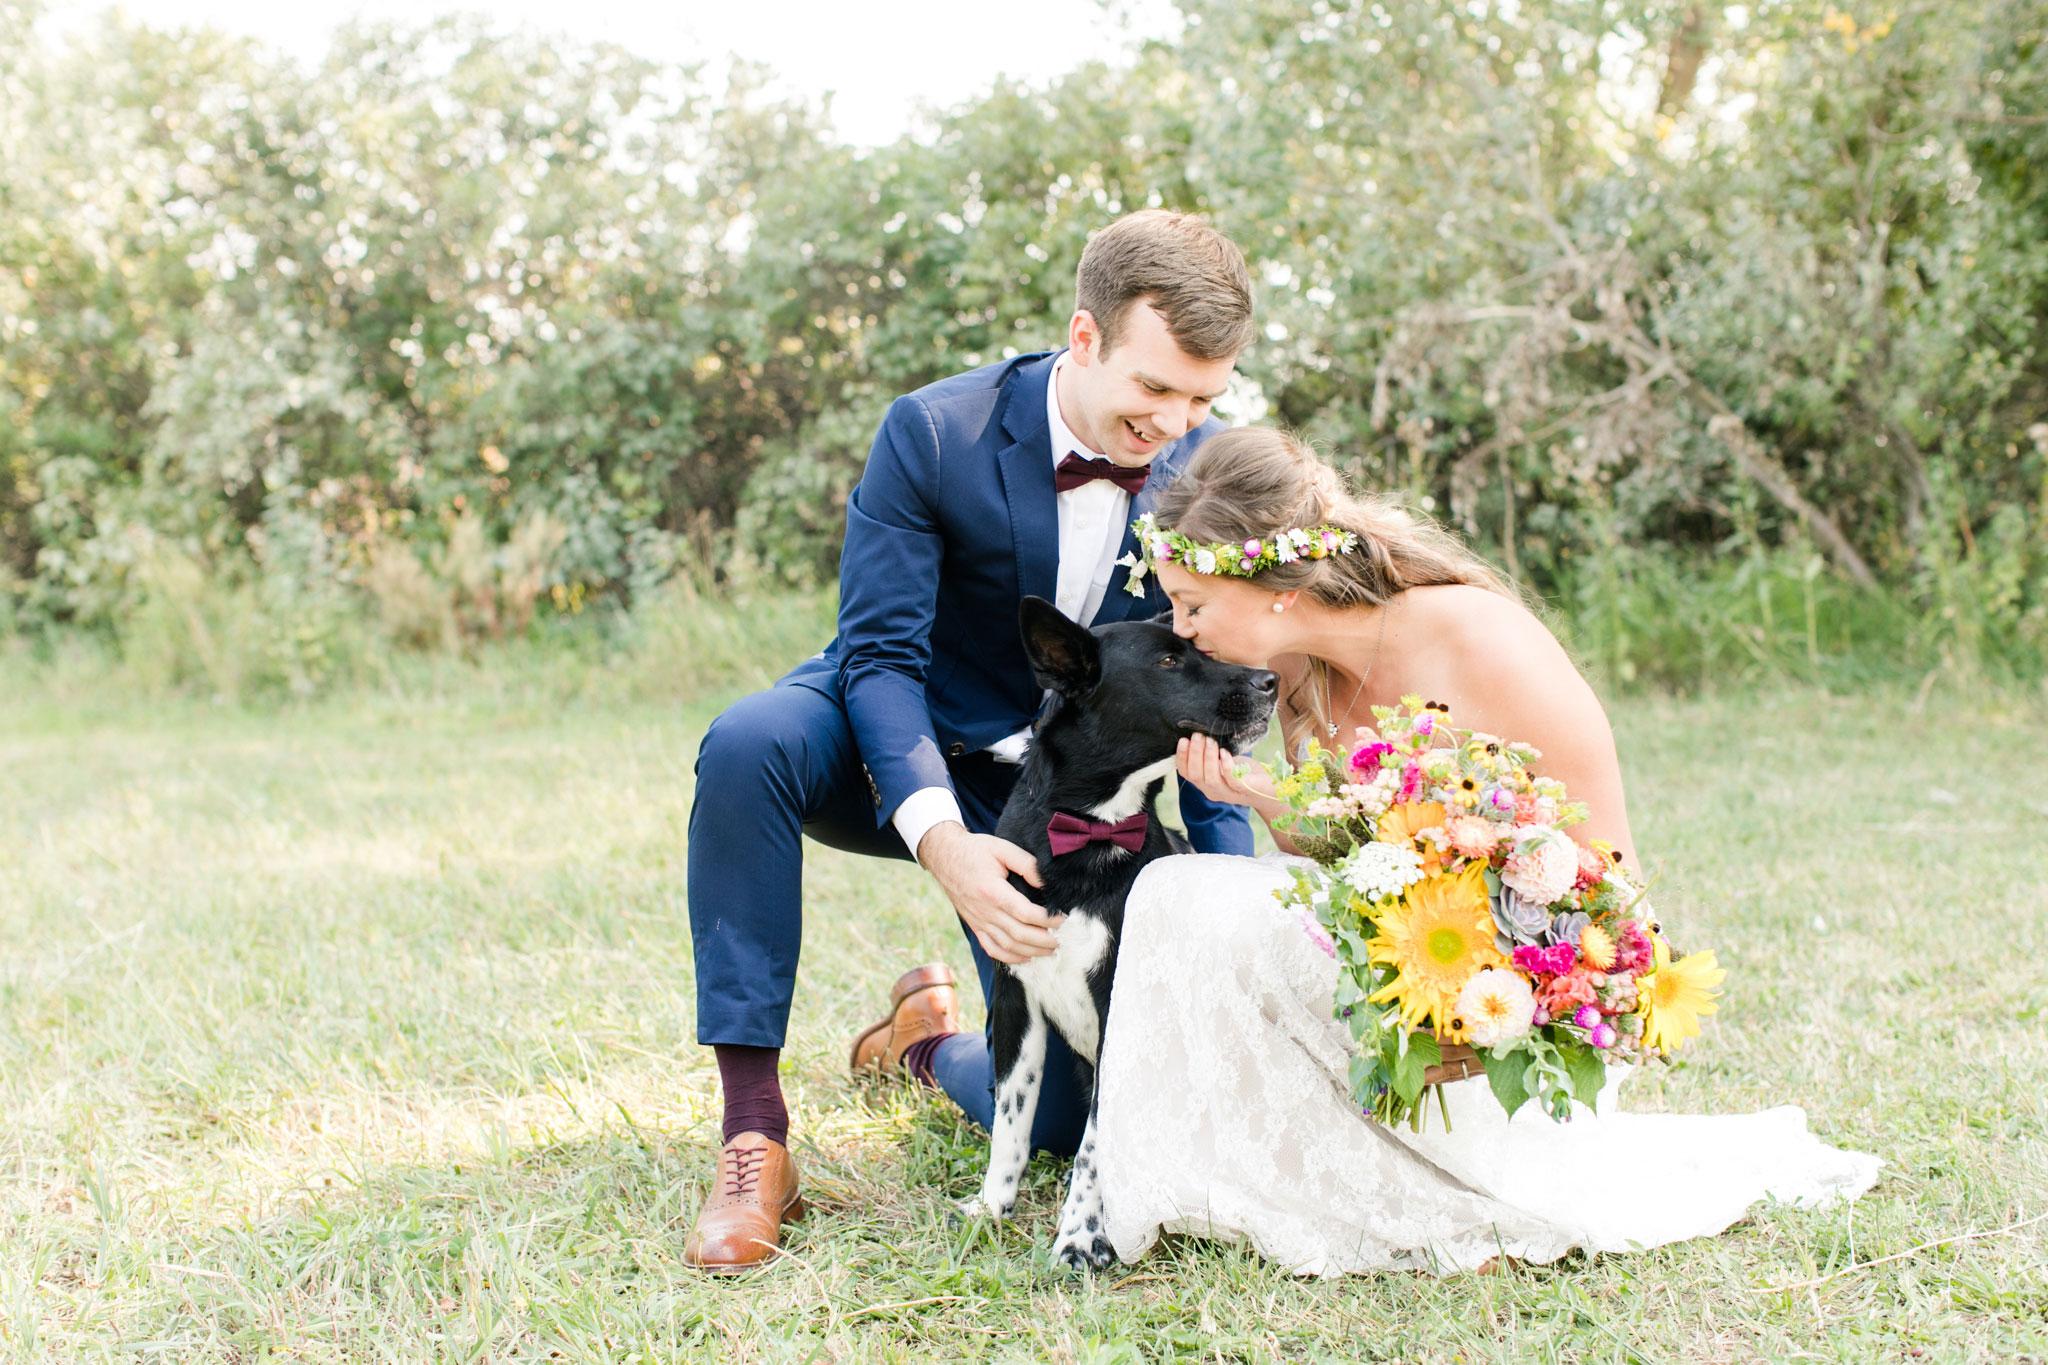 Bride + Groom + Dog | A Boho Garden Wedding in Colorado